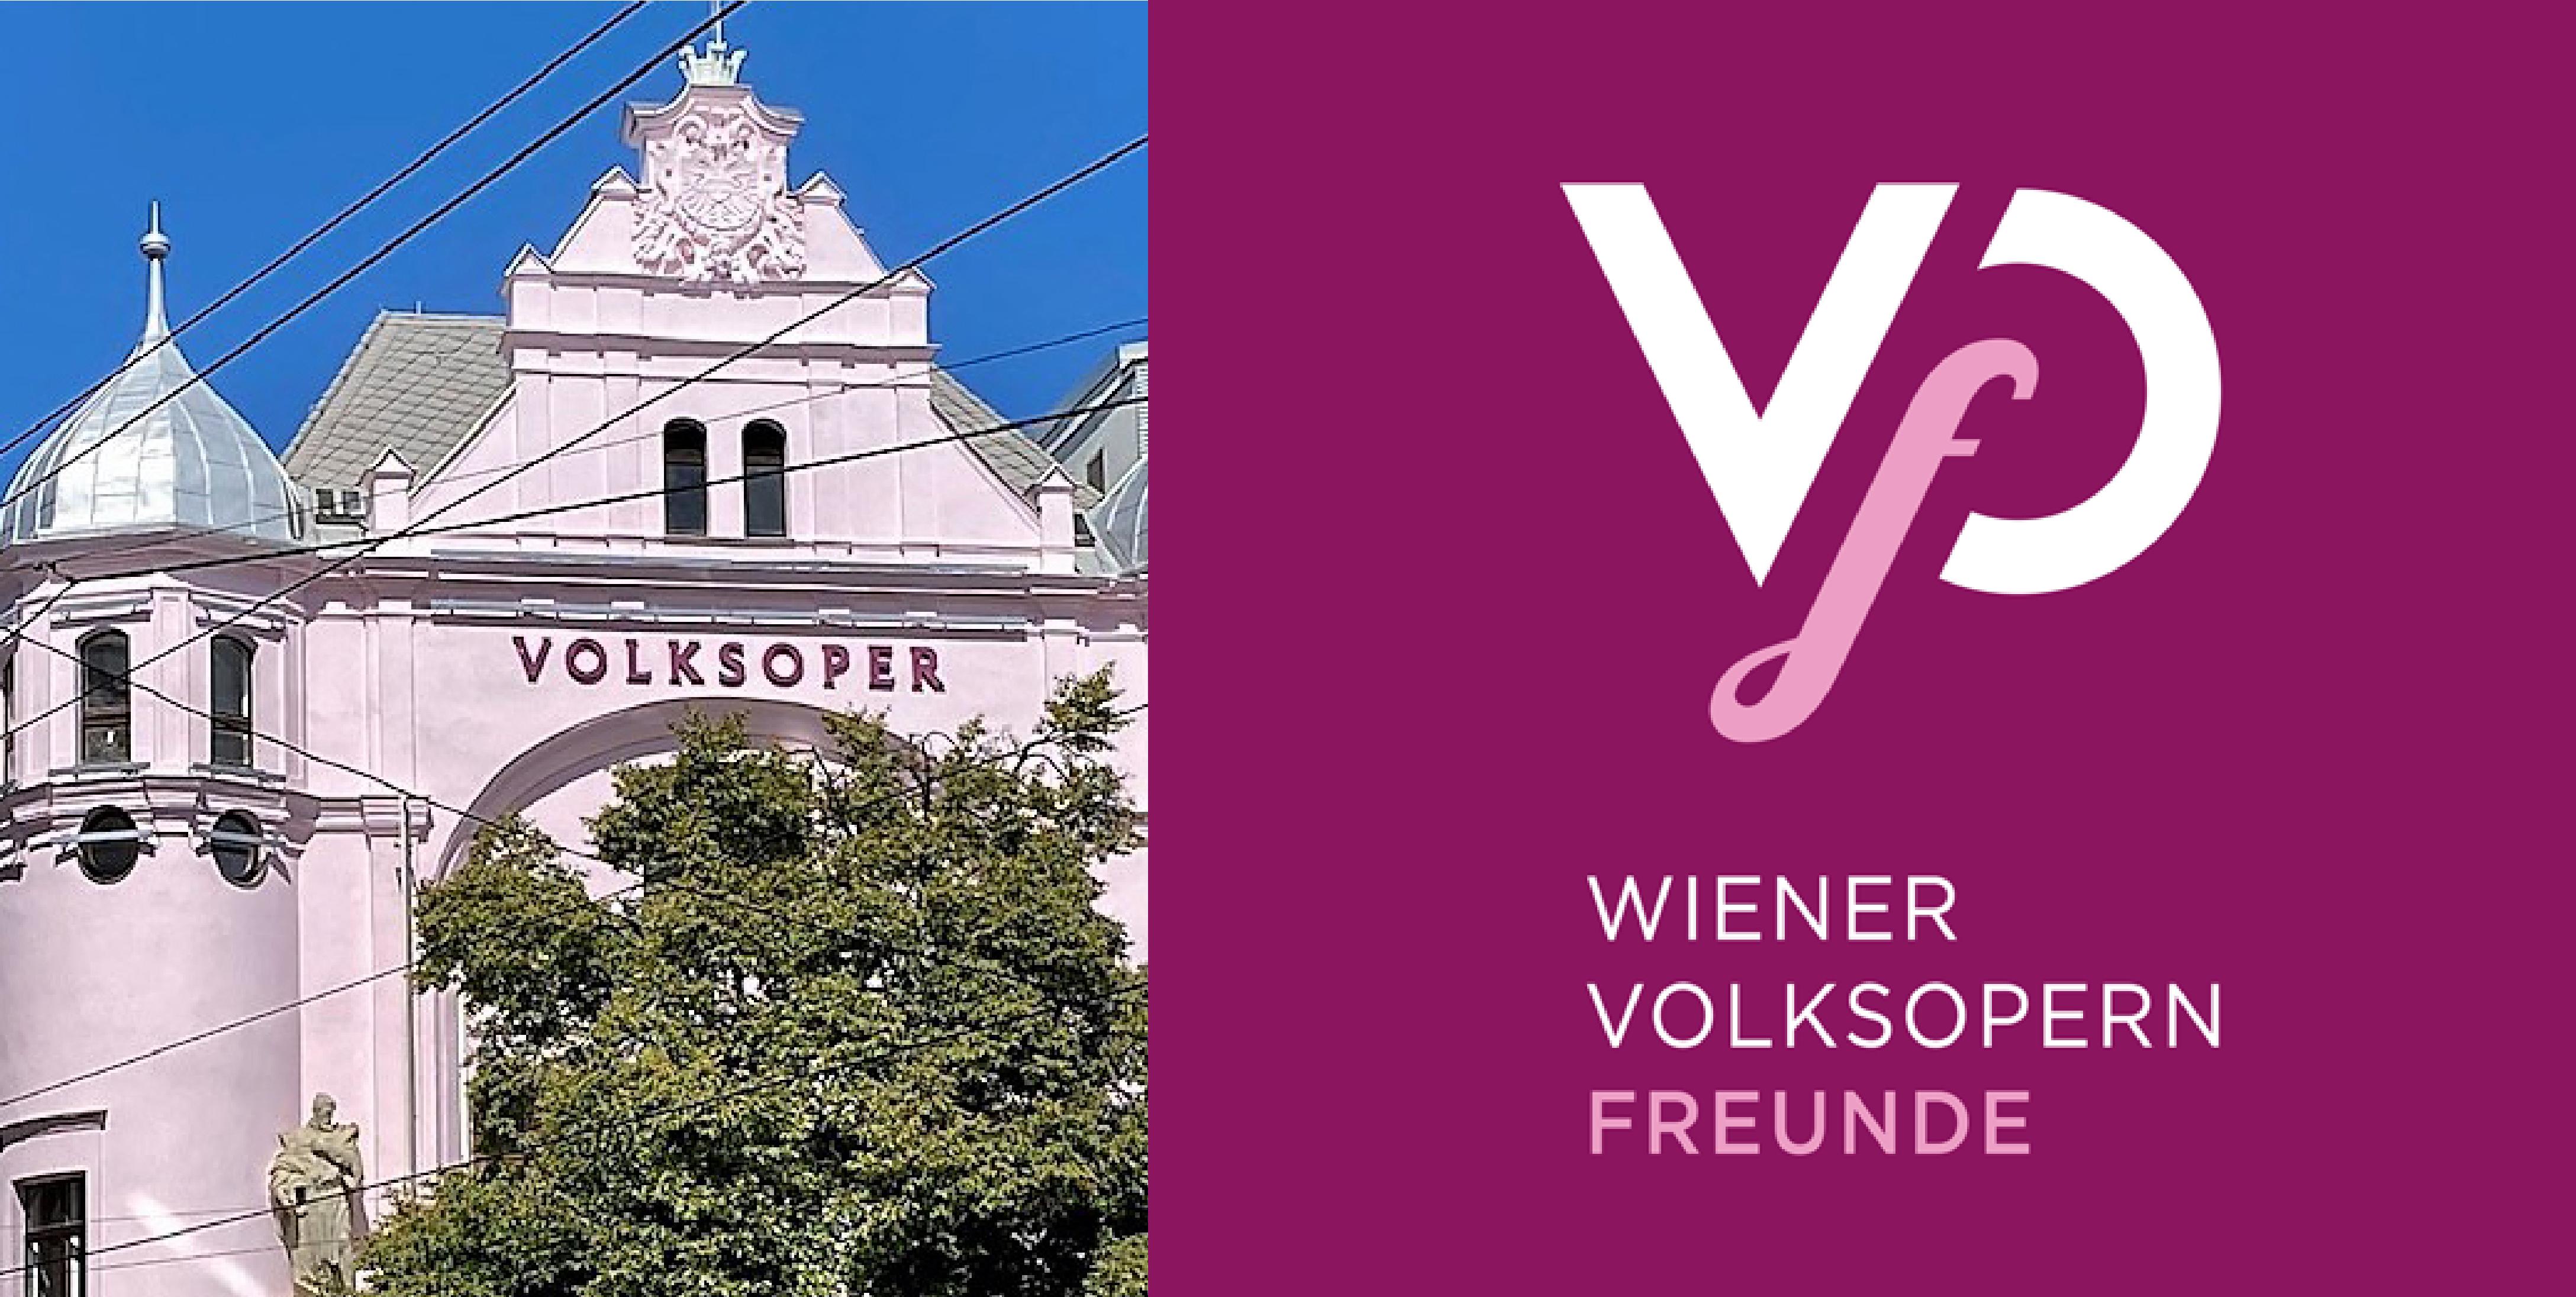 Gebäude der Wiener Volksoper © Volksoper Wien, Logo VOF